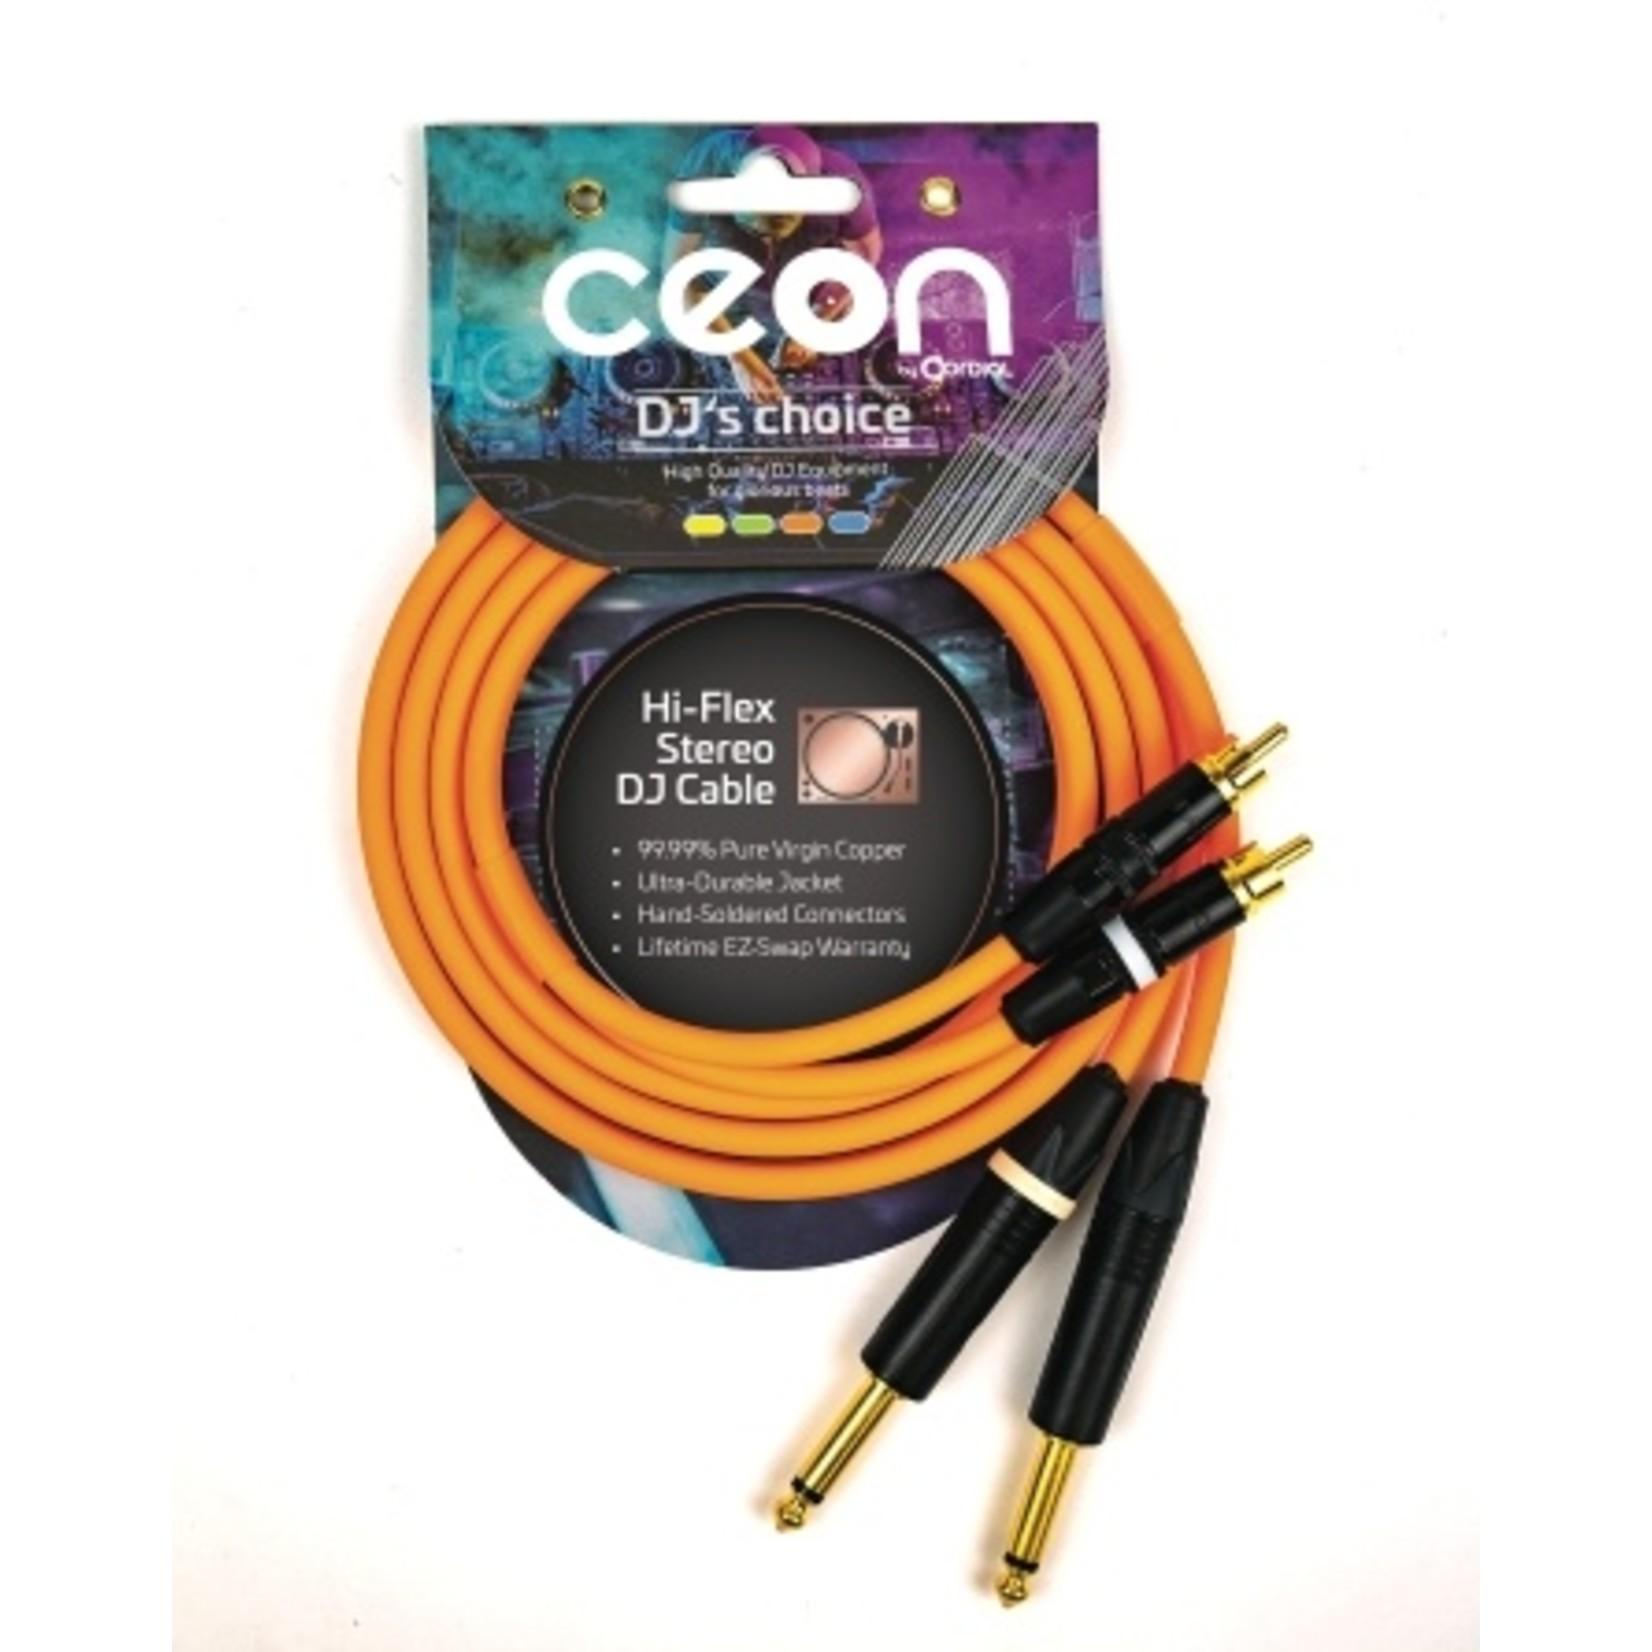 "Cordial Cables Cordial Cables Premium DJ Dual/Mono (Black Light) Cable, Ceon Series - Hi-Flex DJ's Choice Stereo RCA to 1/4"" TS 10-Foot Cable: Neon Orange"